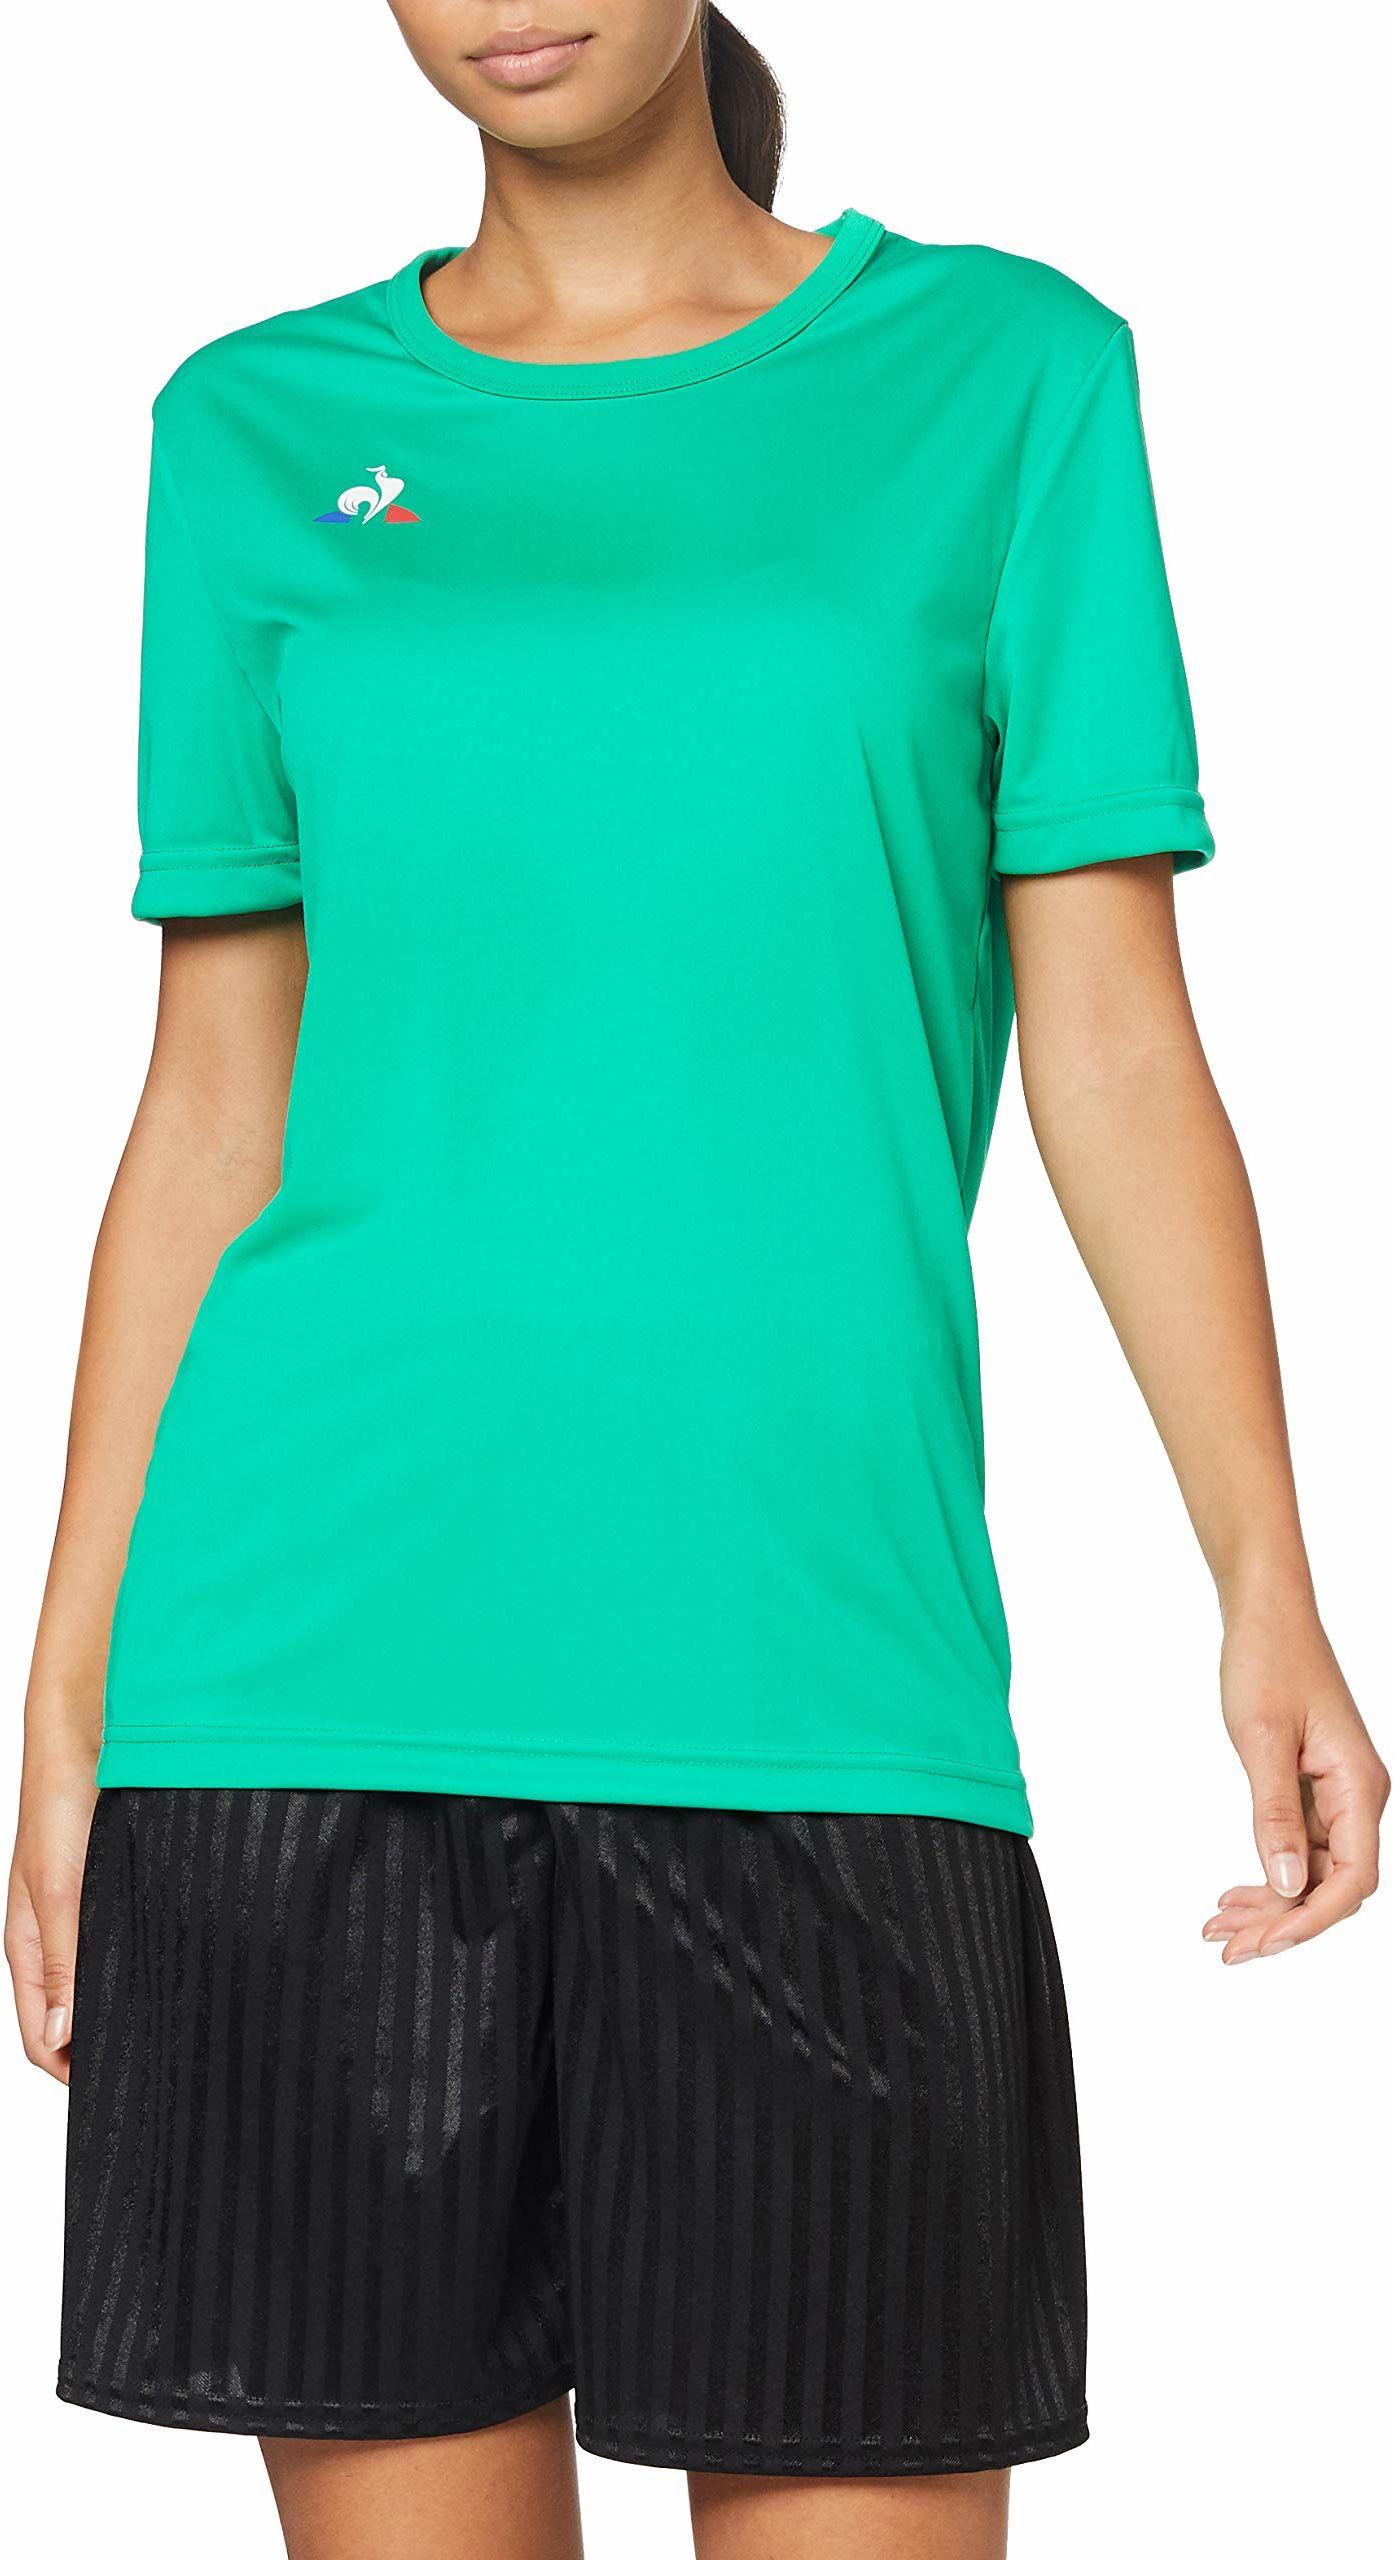 Le Coq Sportif damska N 1 Maillot Match Mc St Etienne T-shirt, XL